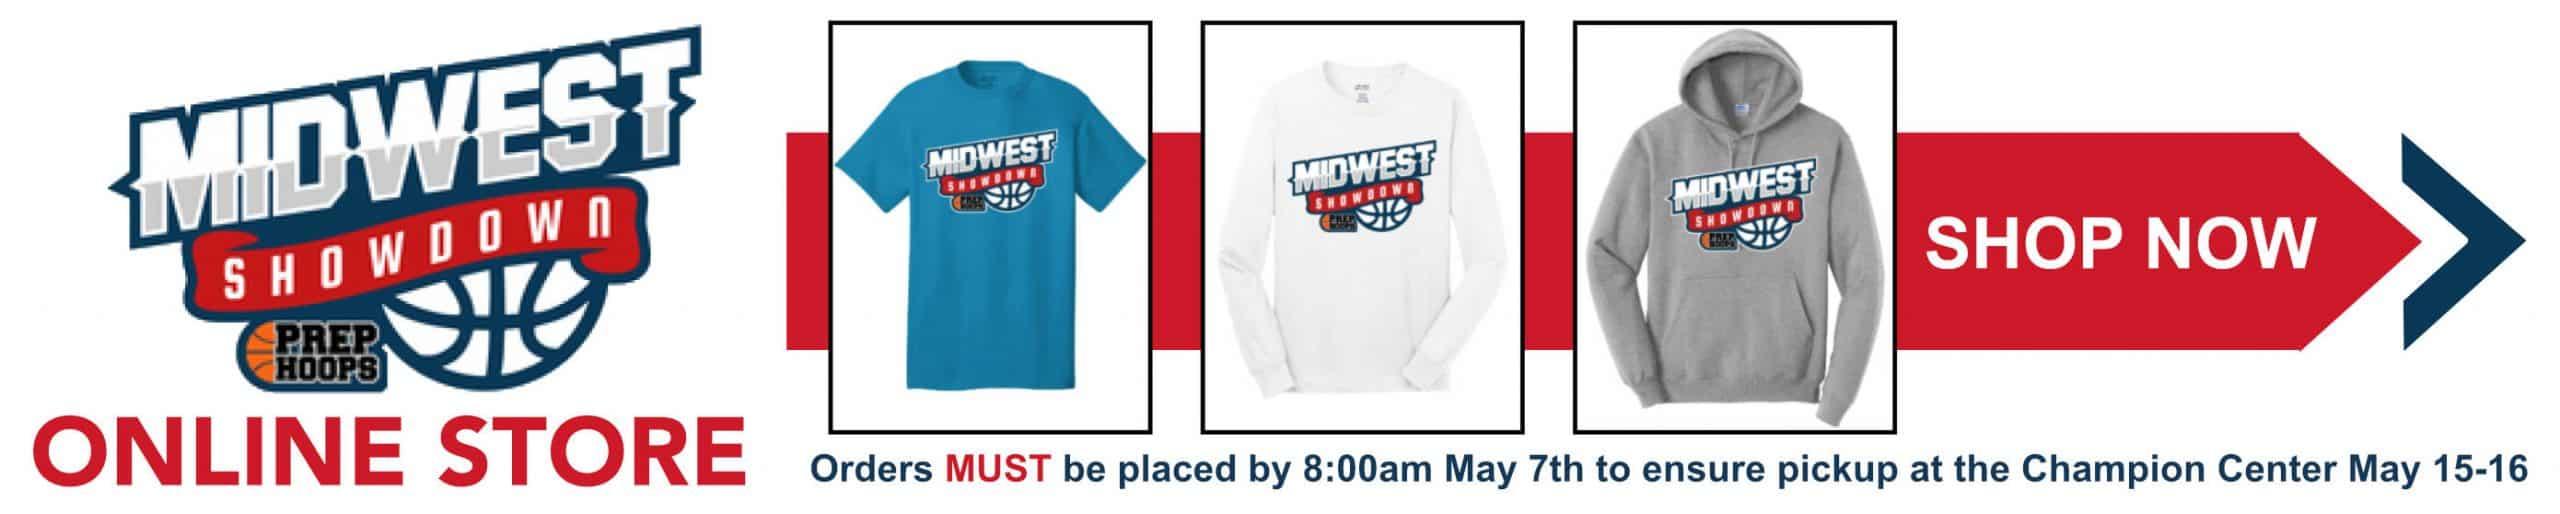 midwest showdown online store